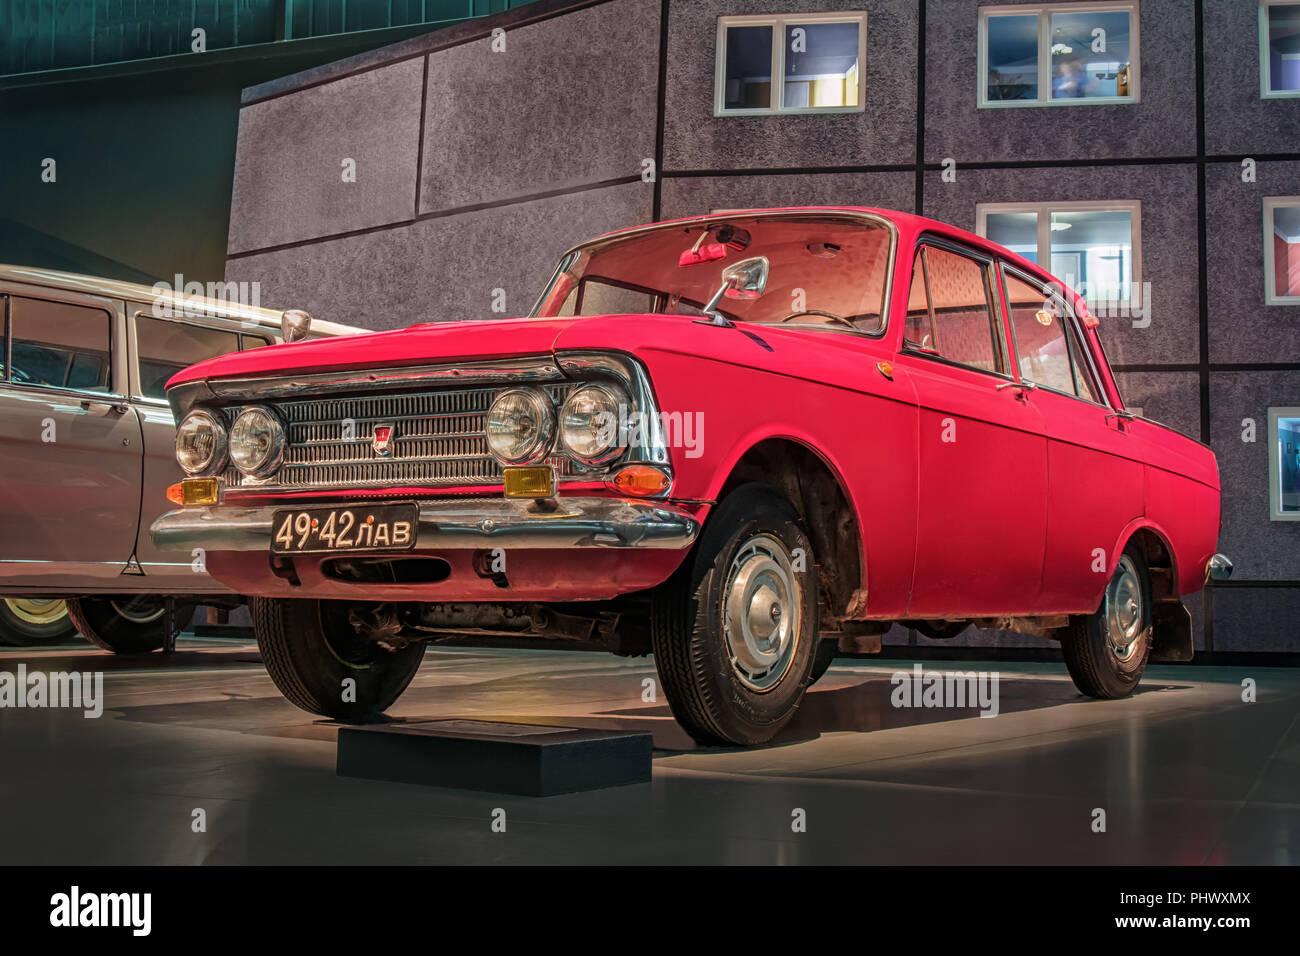 RIGA, LATVIA-APRIL 18, 2018: Soviet car 1968 Moskvitch 408 in the Riga Motor Museum. - Stock Image